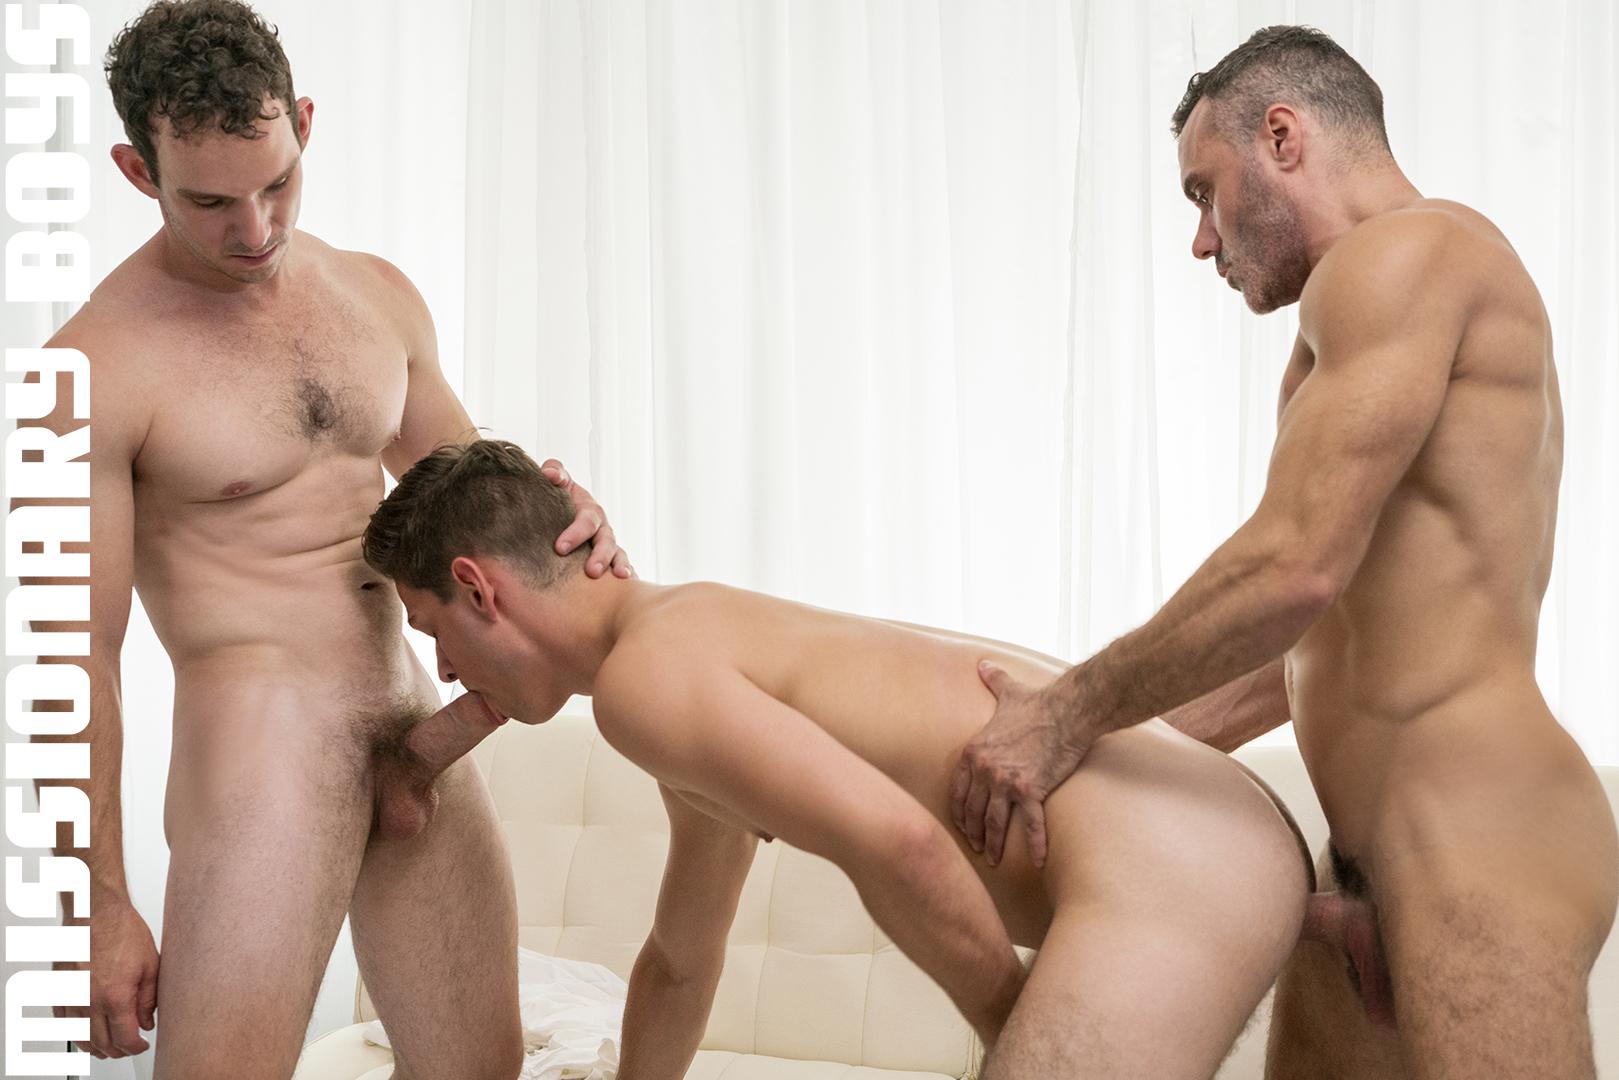 180828_mbz_06-missionaryboys-gay-daddy-son-sex_pic11